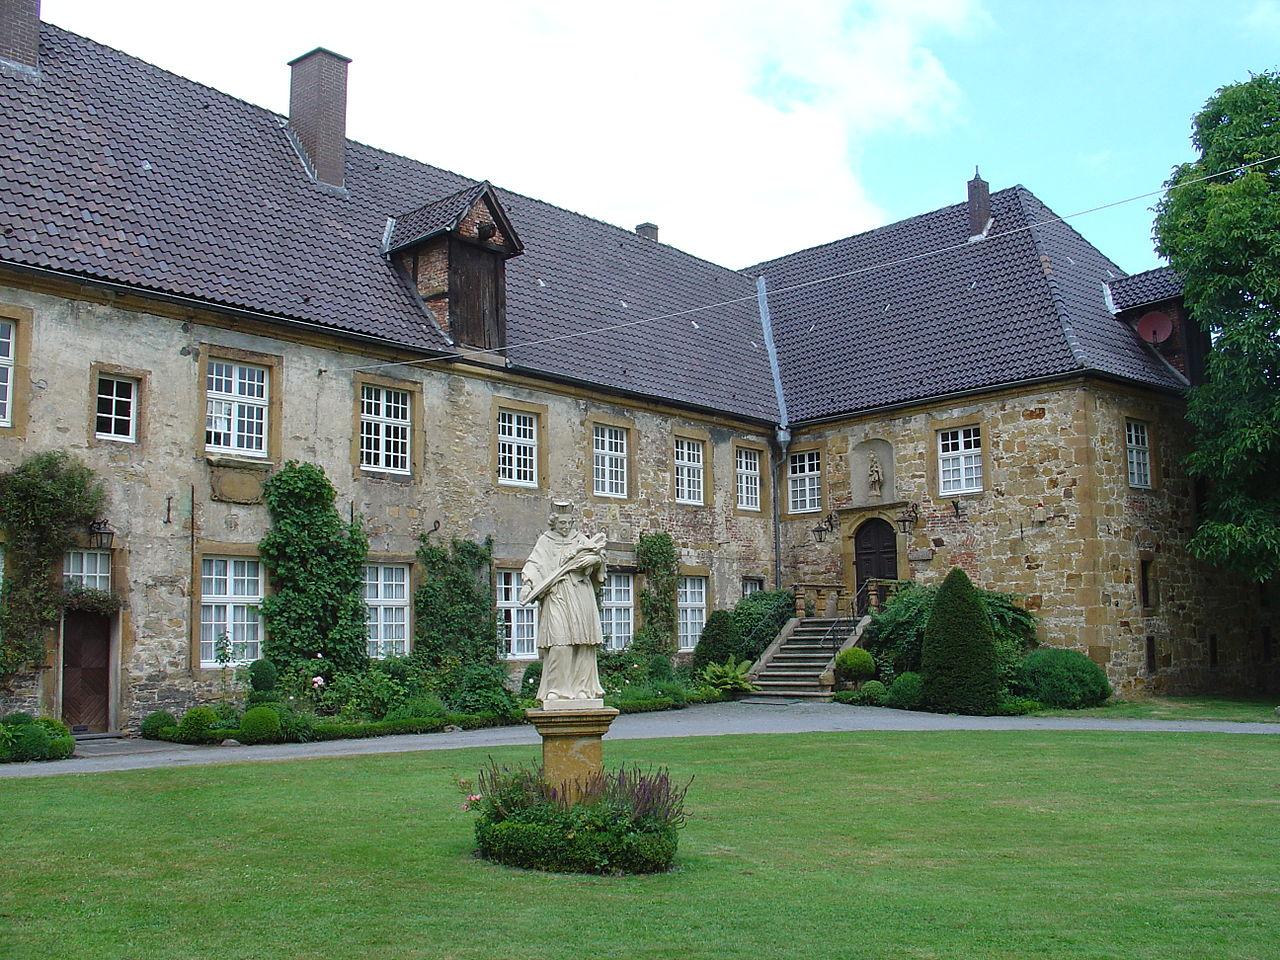 Bild Kloster Herzebrock Clarholz